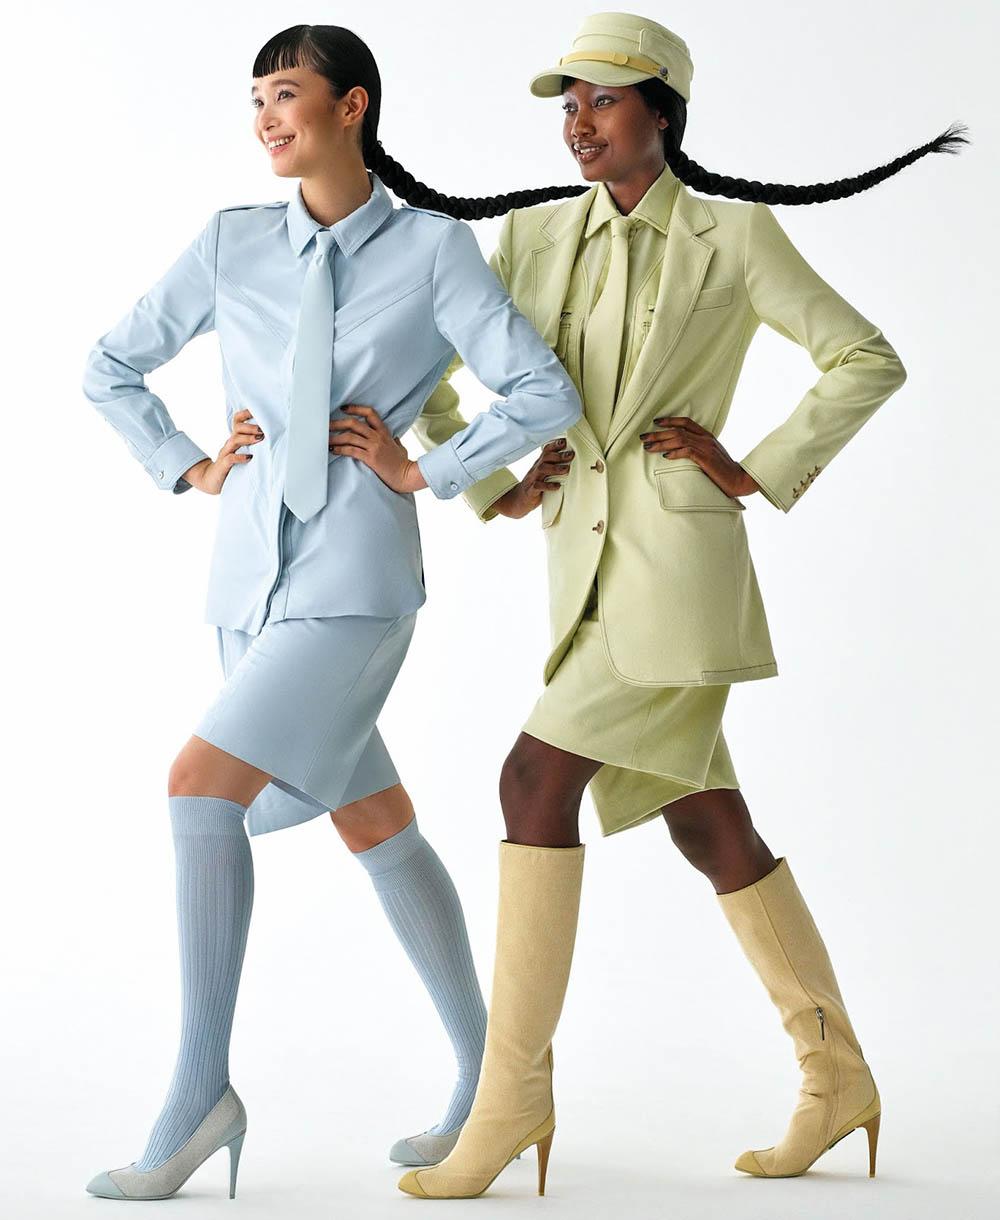 Eniola Abioro and Yuka Mannami by Daniel Clavero for Elle US January 2020